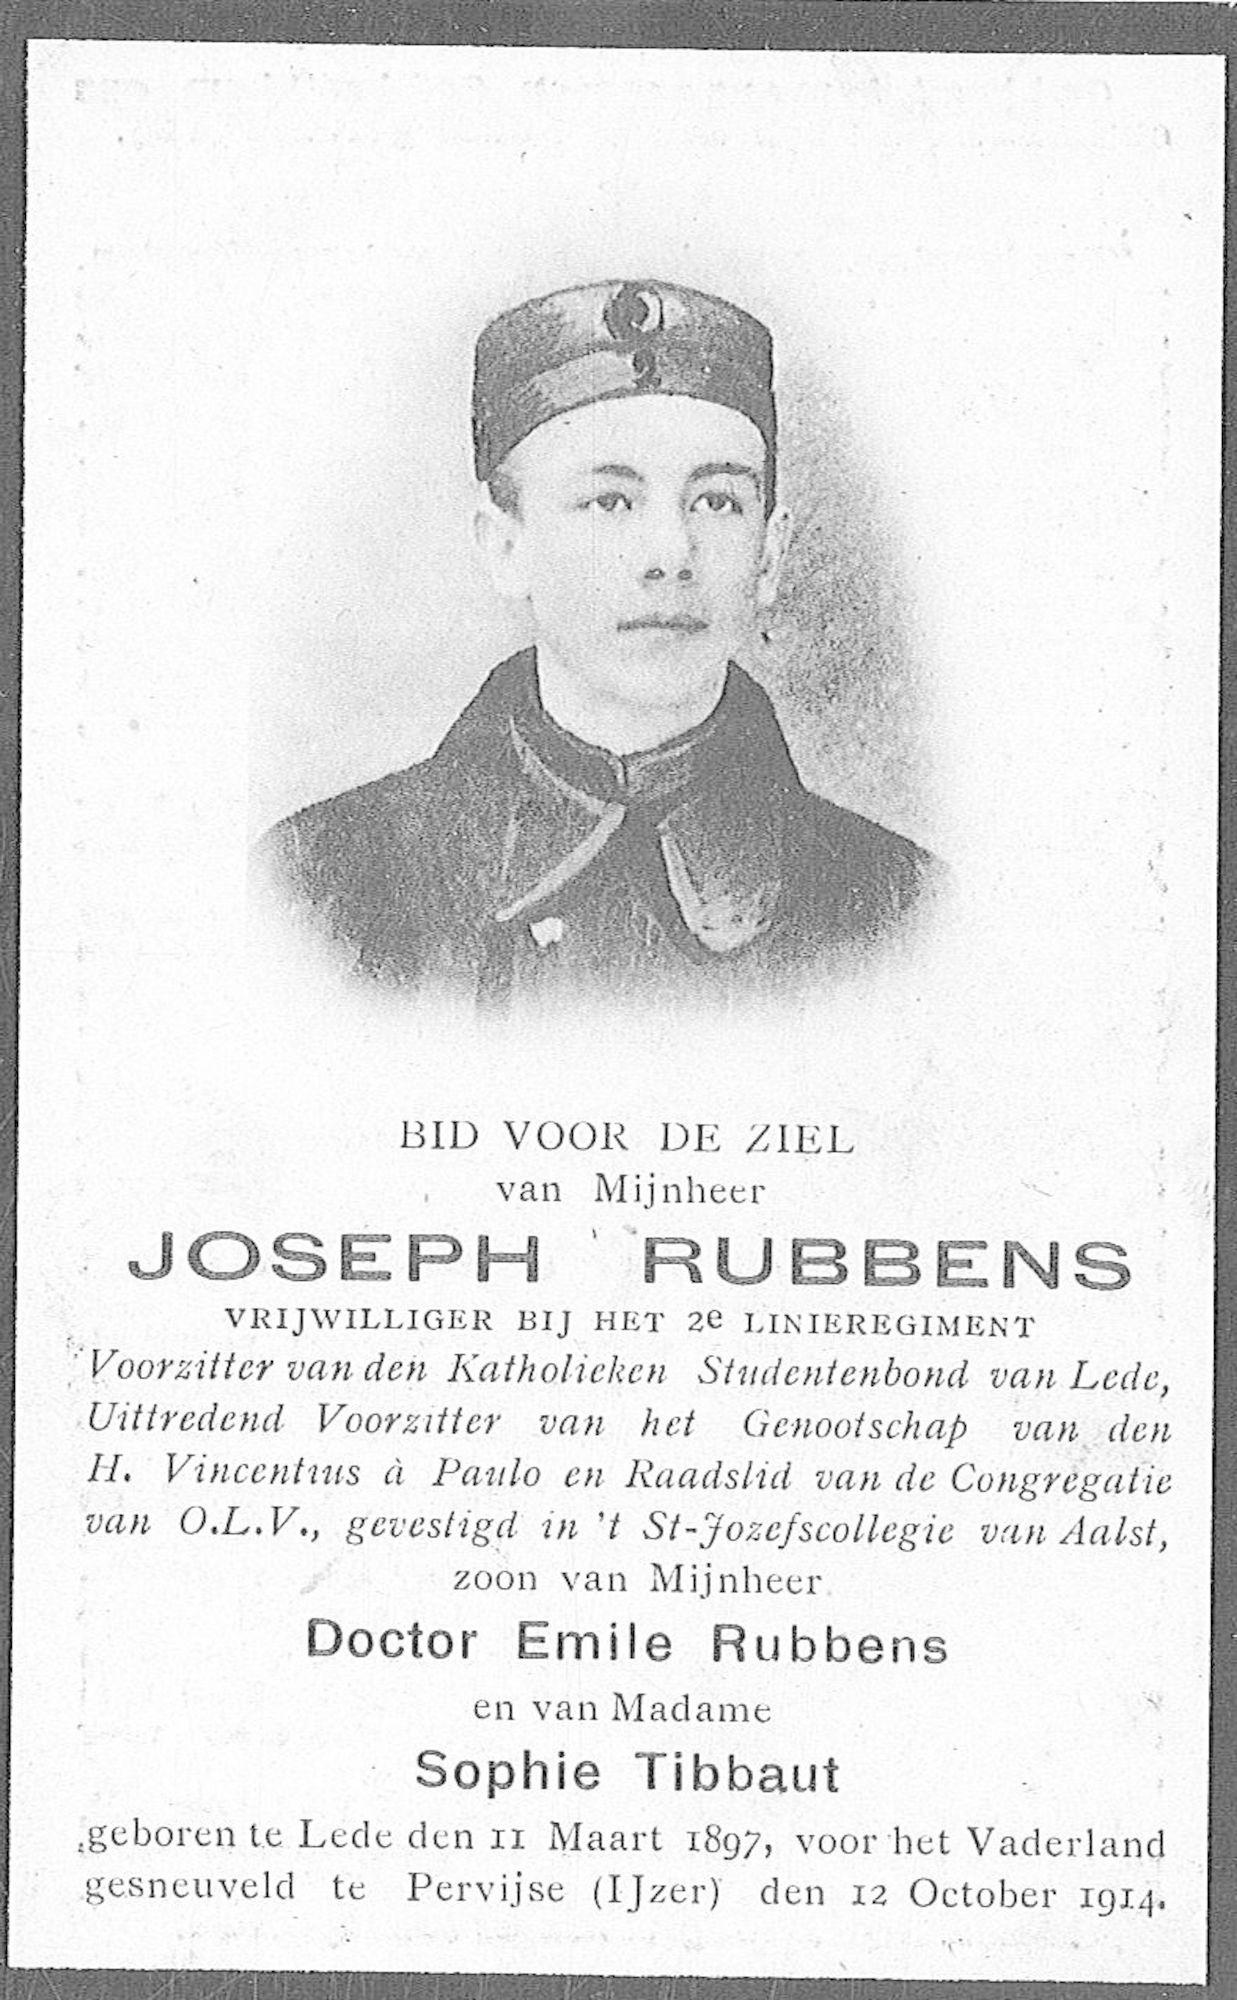 Joseph Rubbens